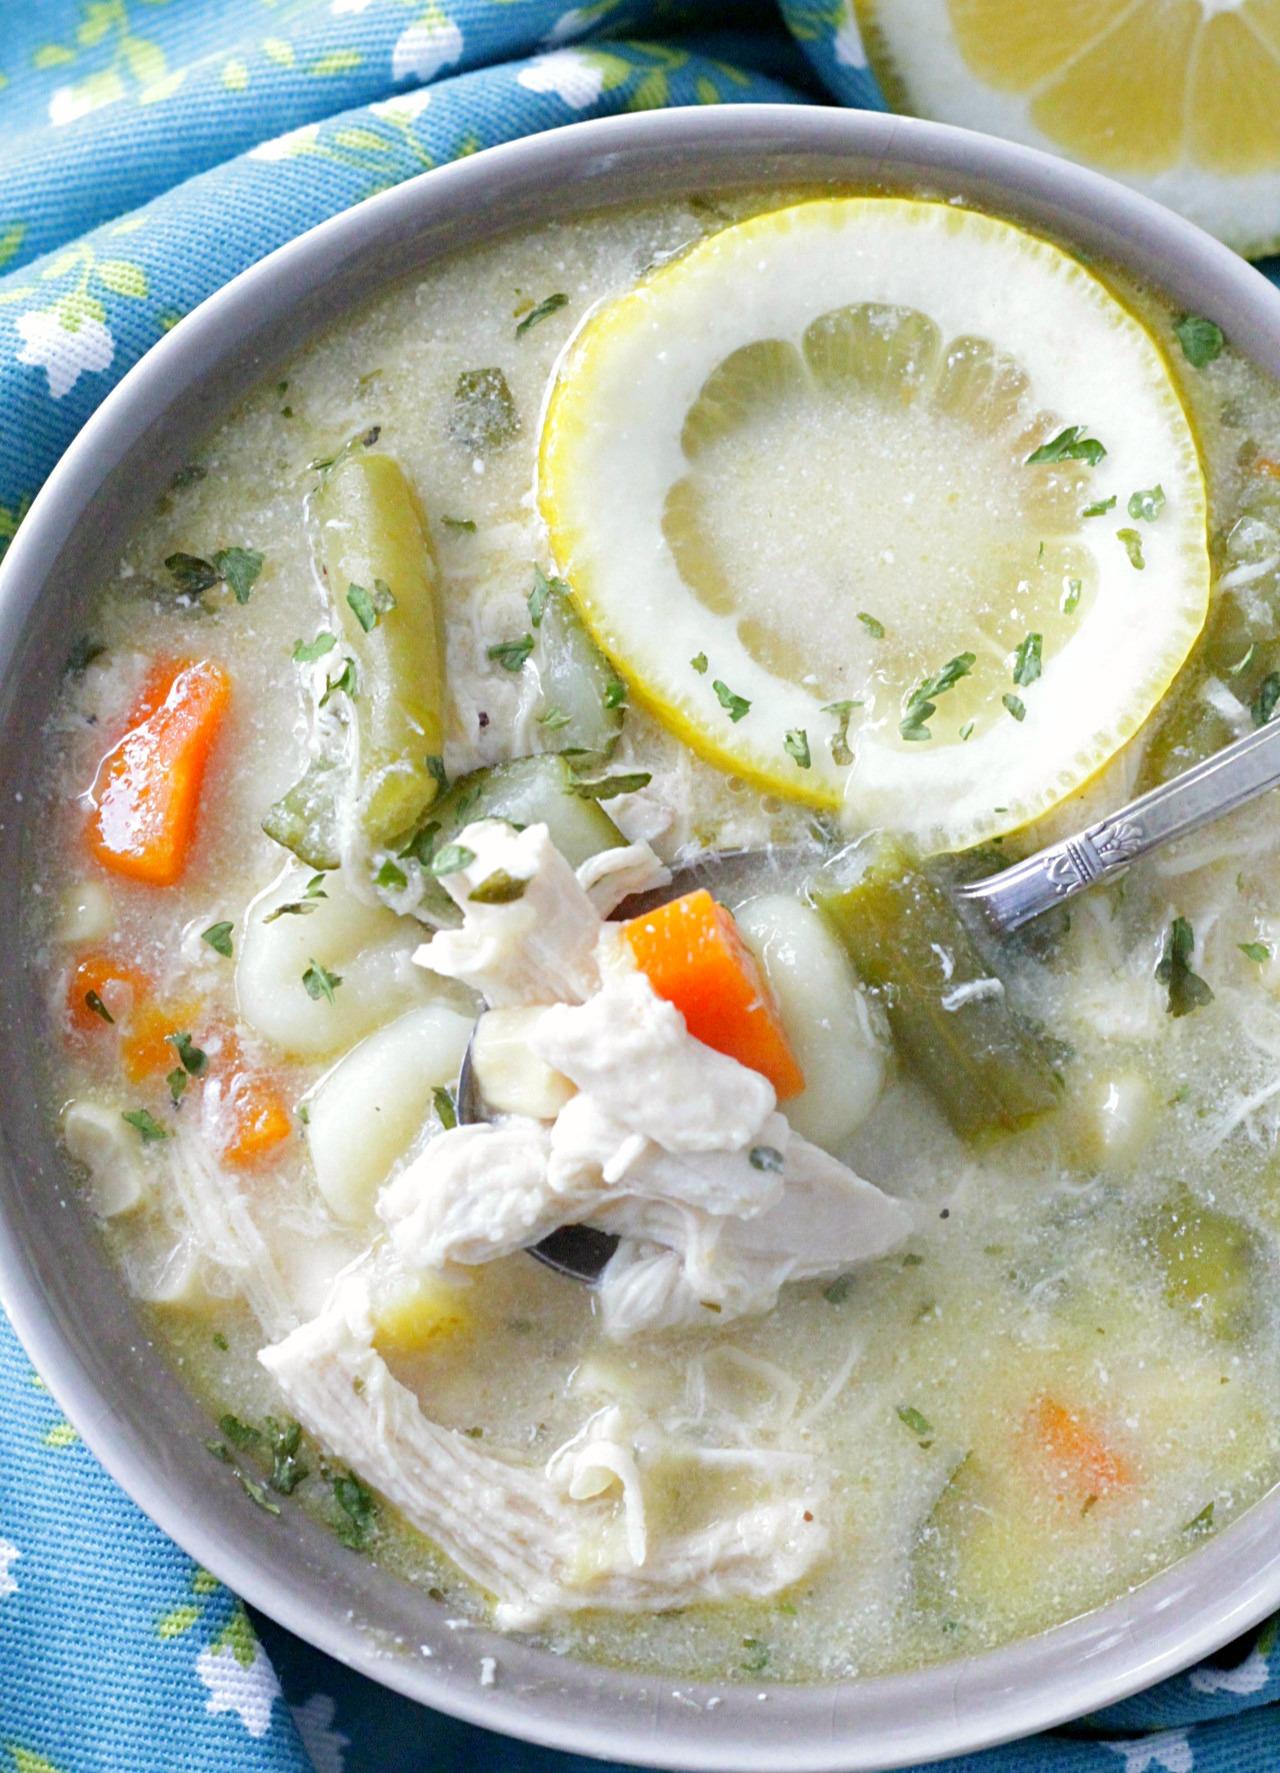 creamy lemon chicken gnocchi soup with lemon slice